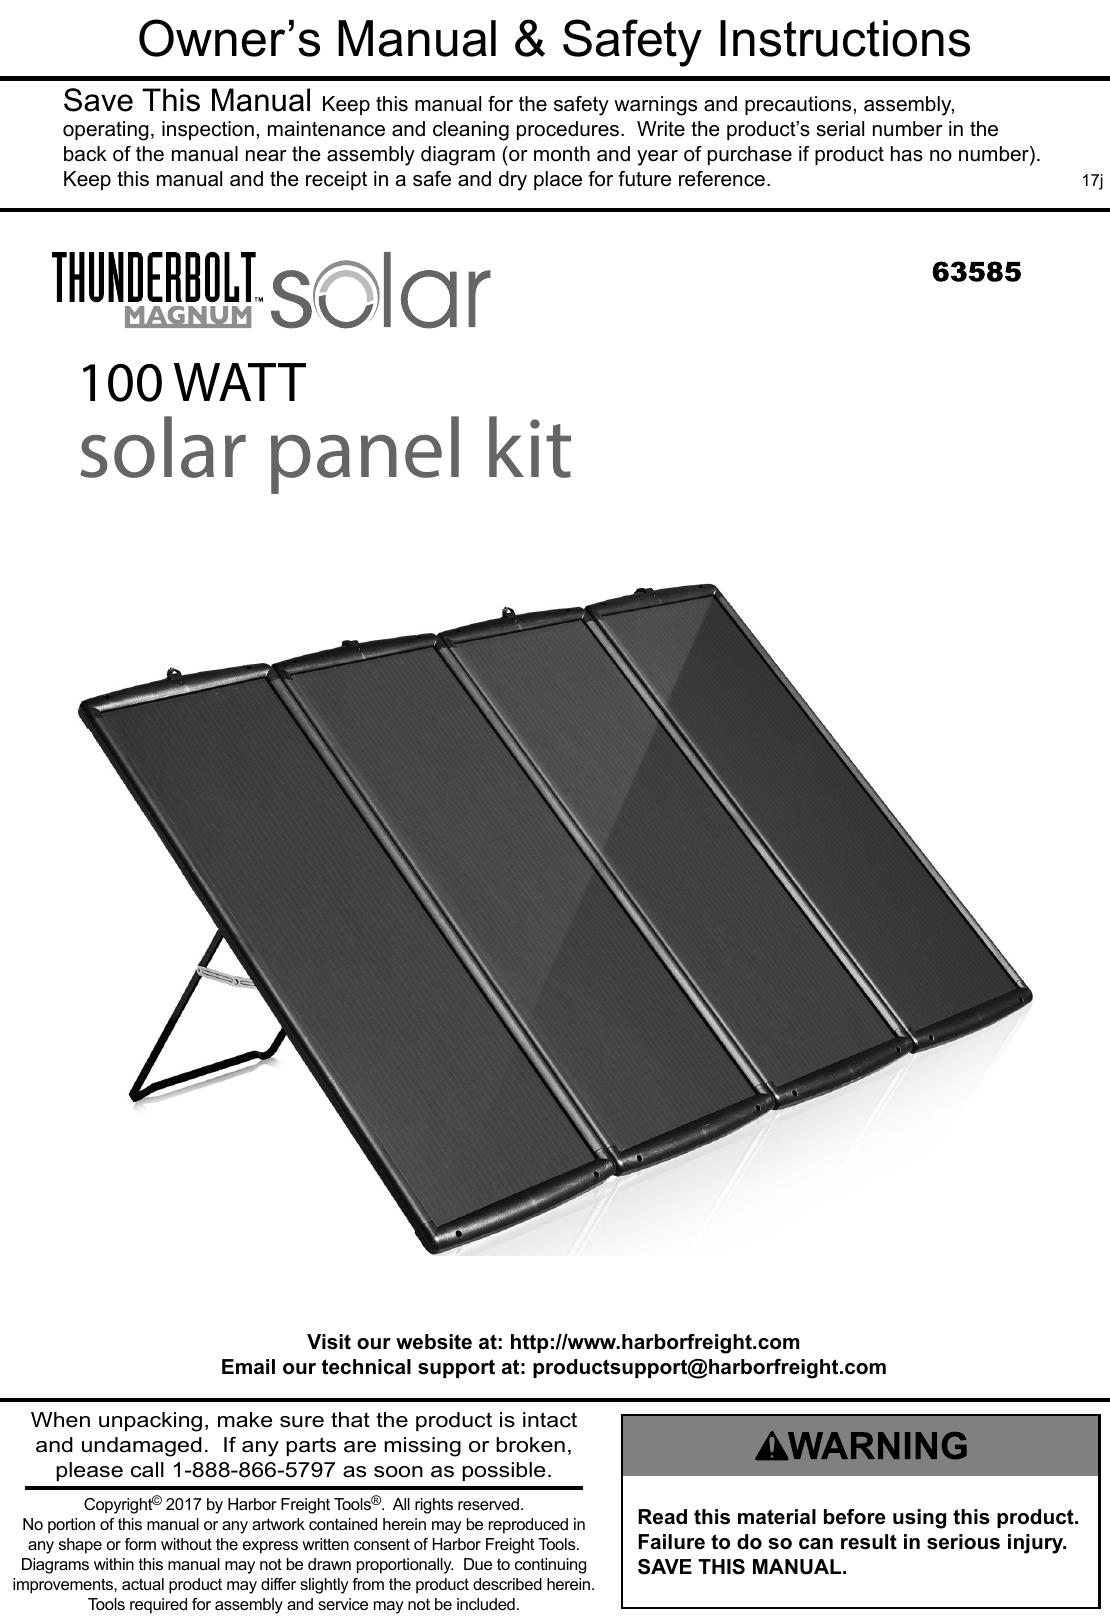 Manual For The 63585 00 Watt Solar Panel Kit